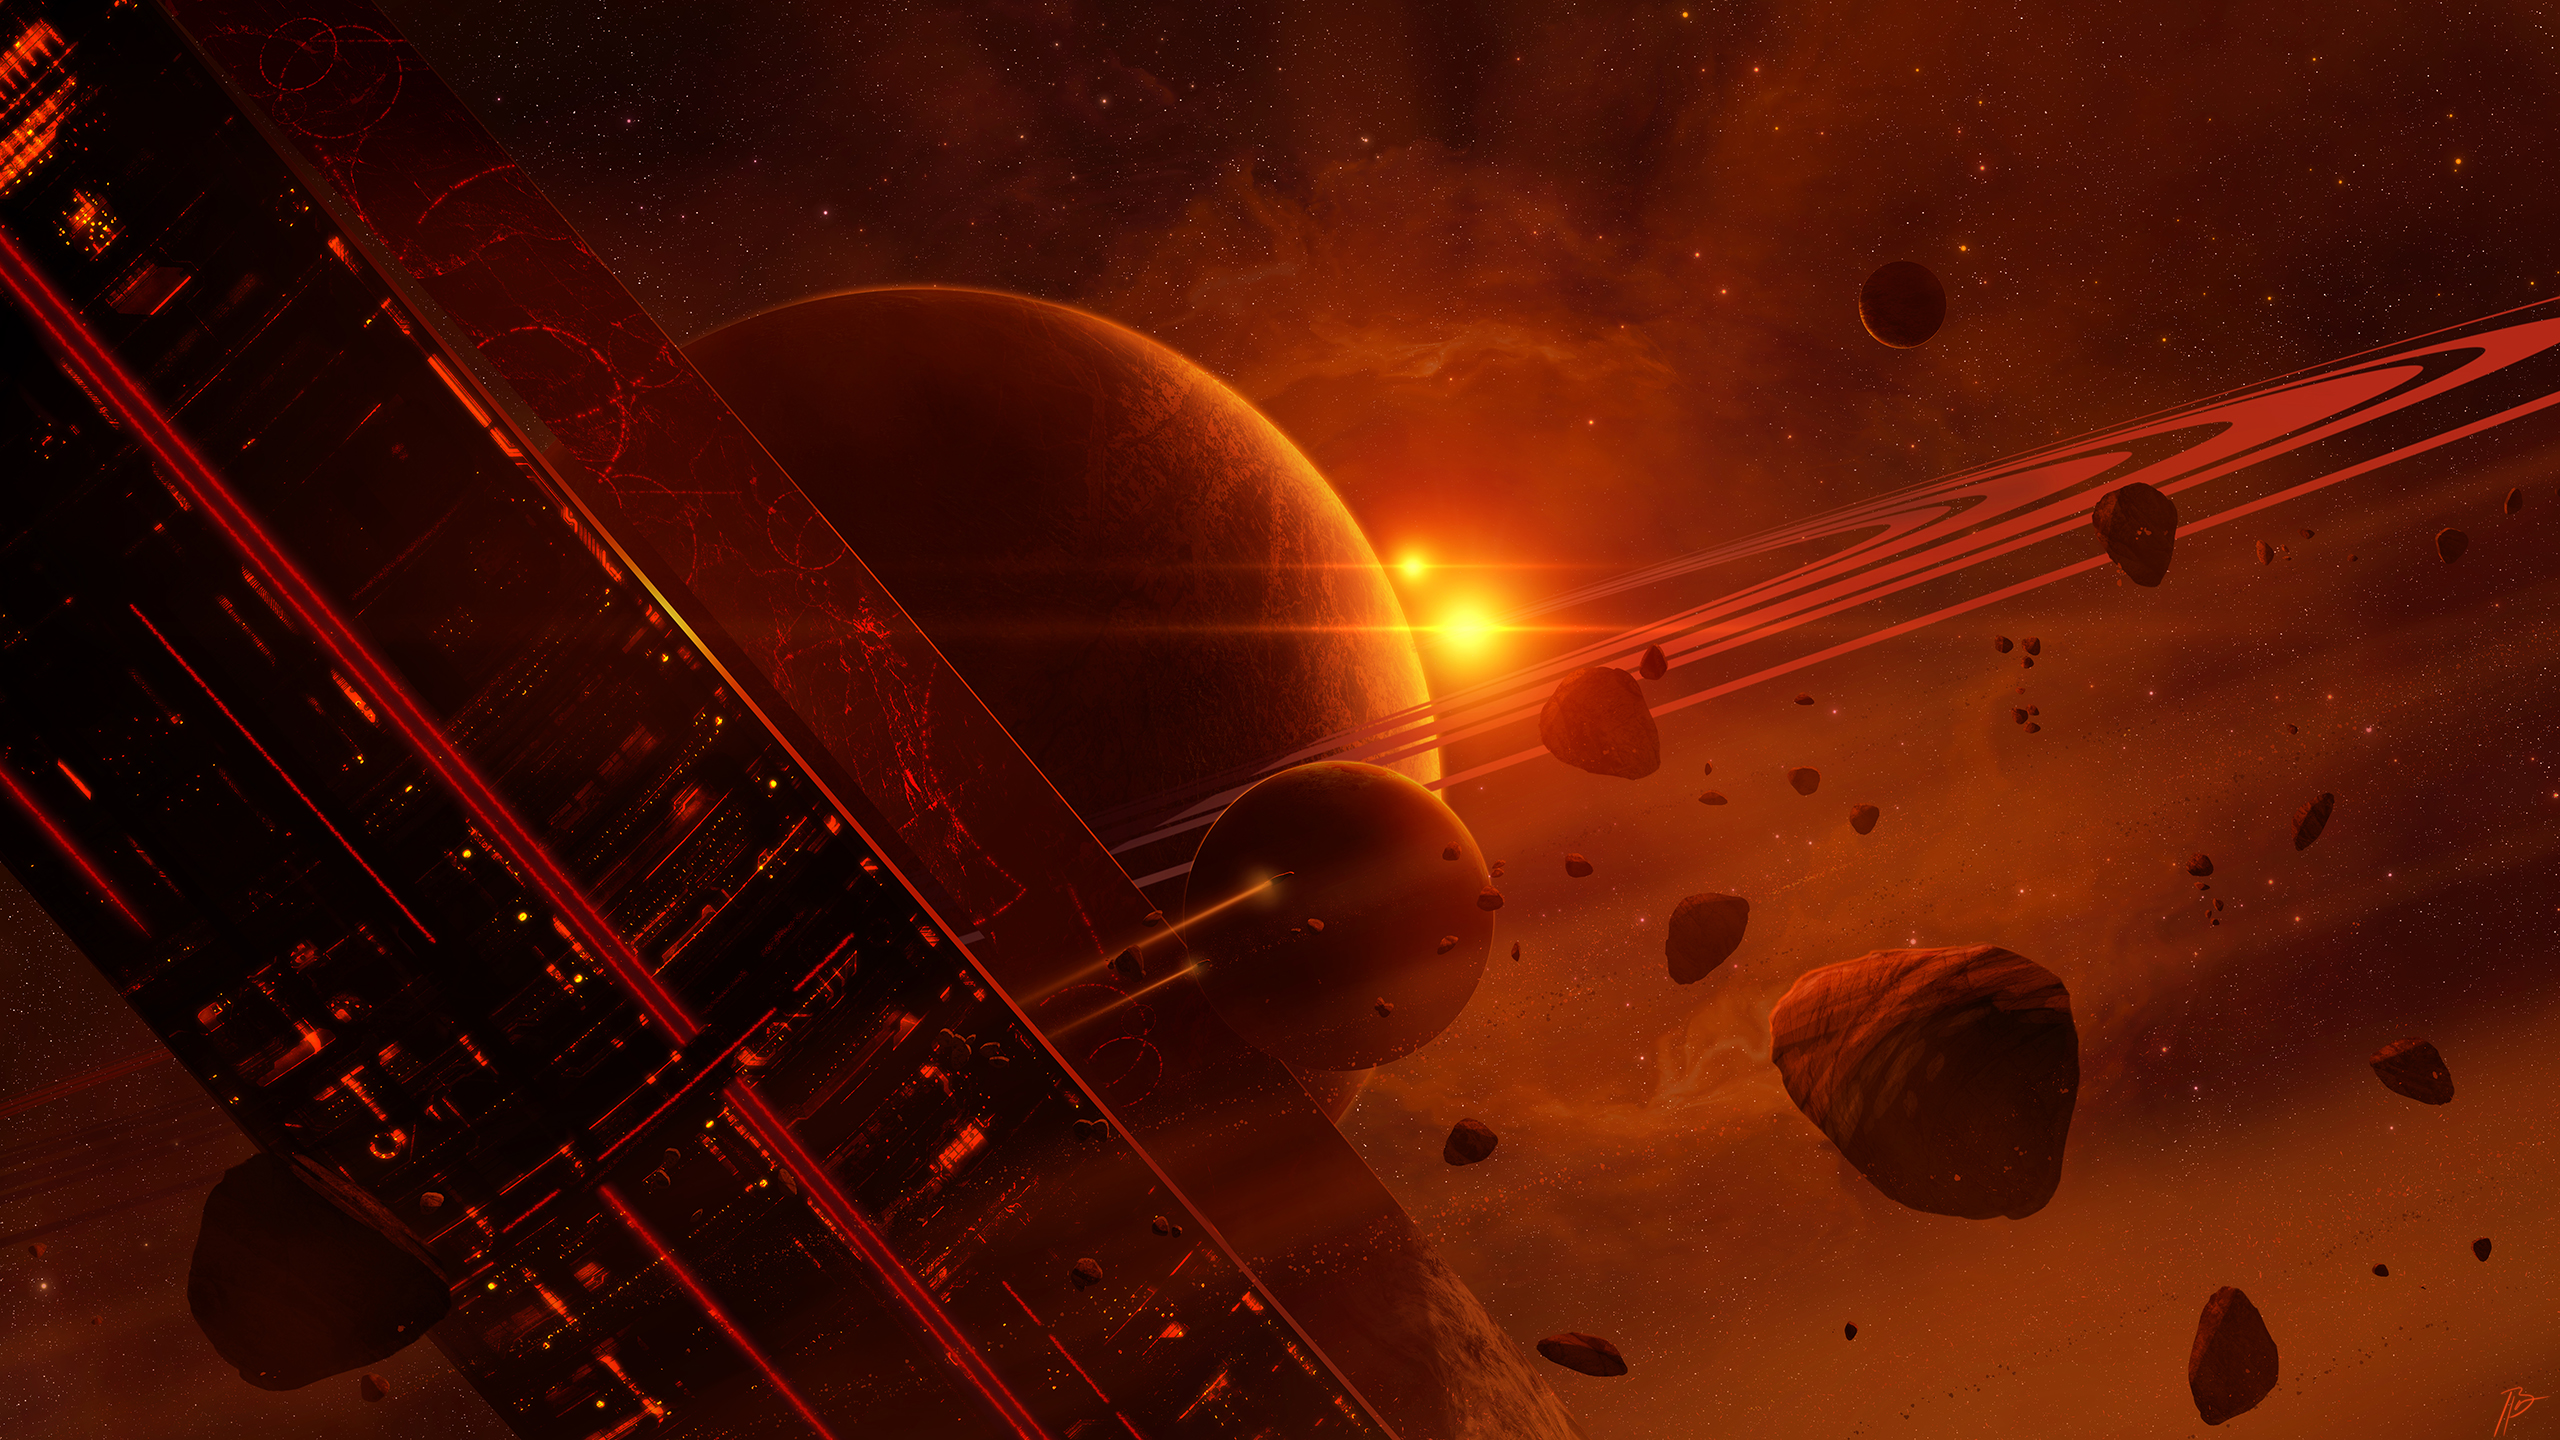 General 2560x1440 space art JoeyJazz Halo 2